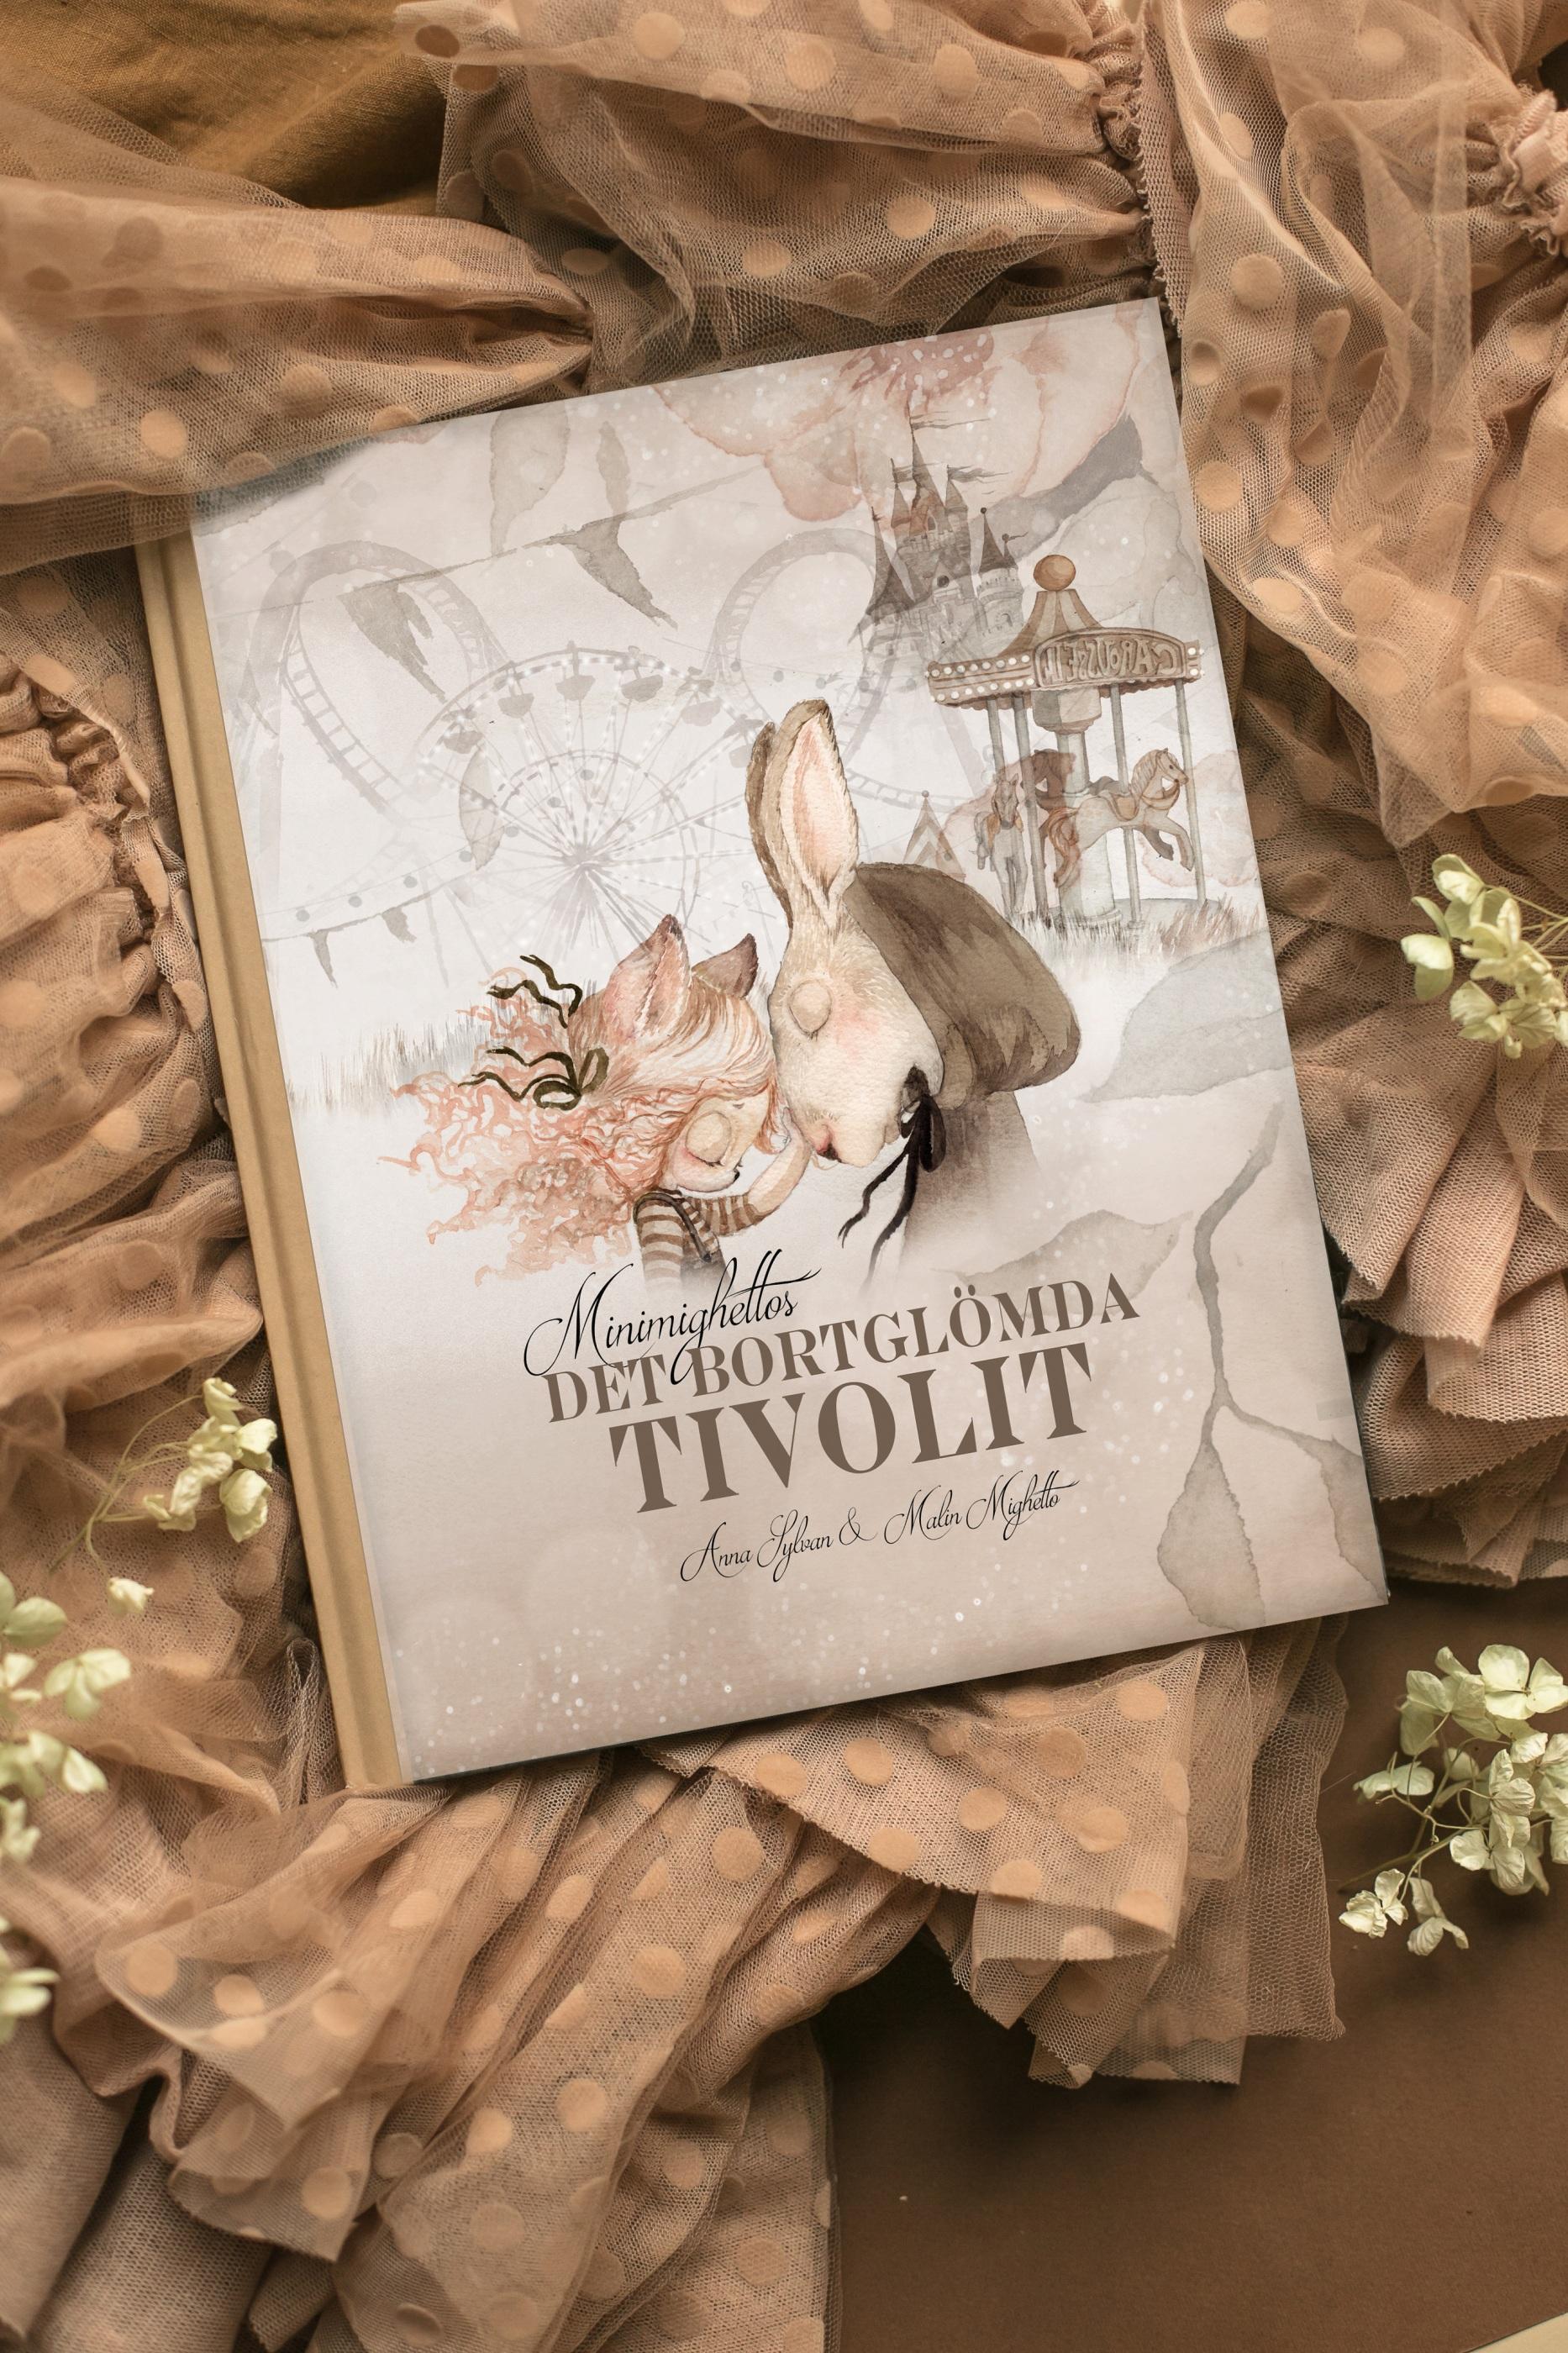 Mrs_Mighetto_Det_Bortglömda_Tivolit-300-1